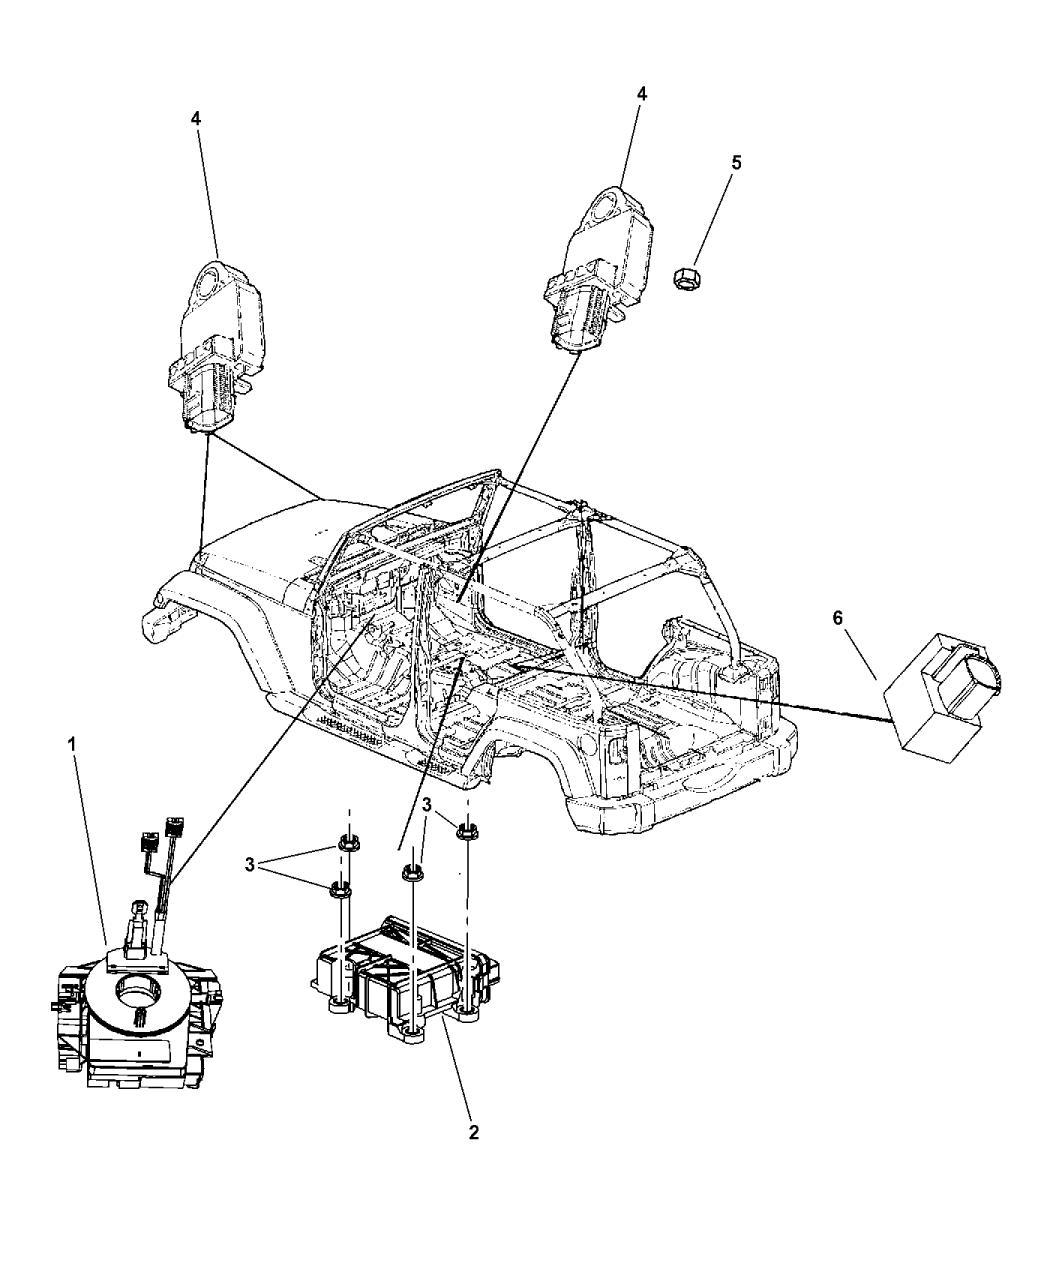 Jeep Jk Clock Spring Wiring Diagram - Lir Wiring 101 Jeep Tj Clock Spring Wiring Diagram on